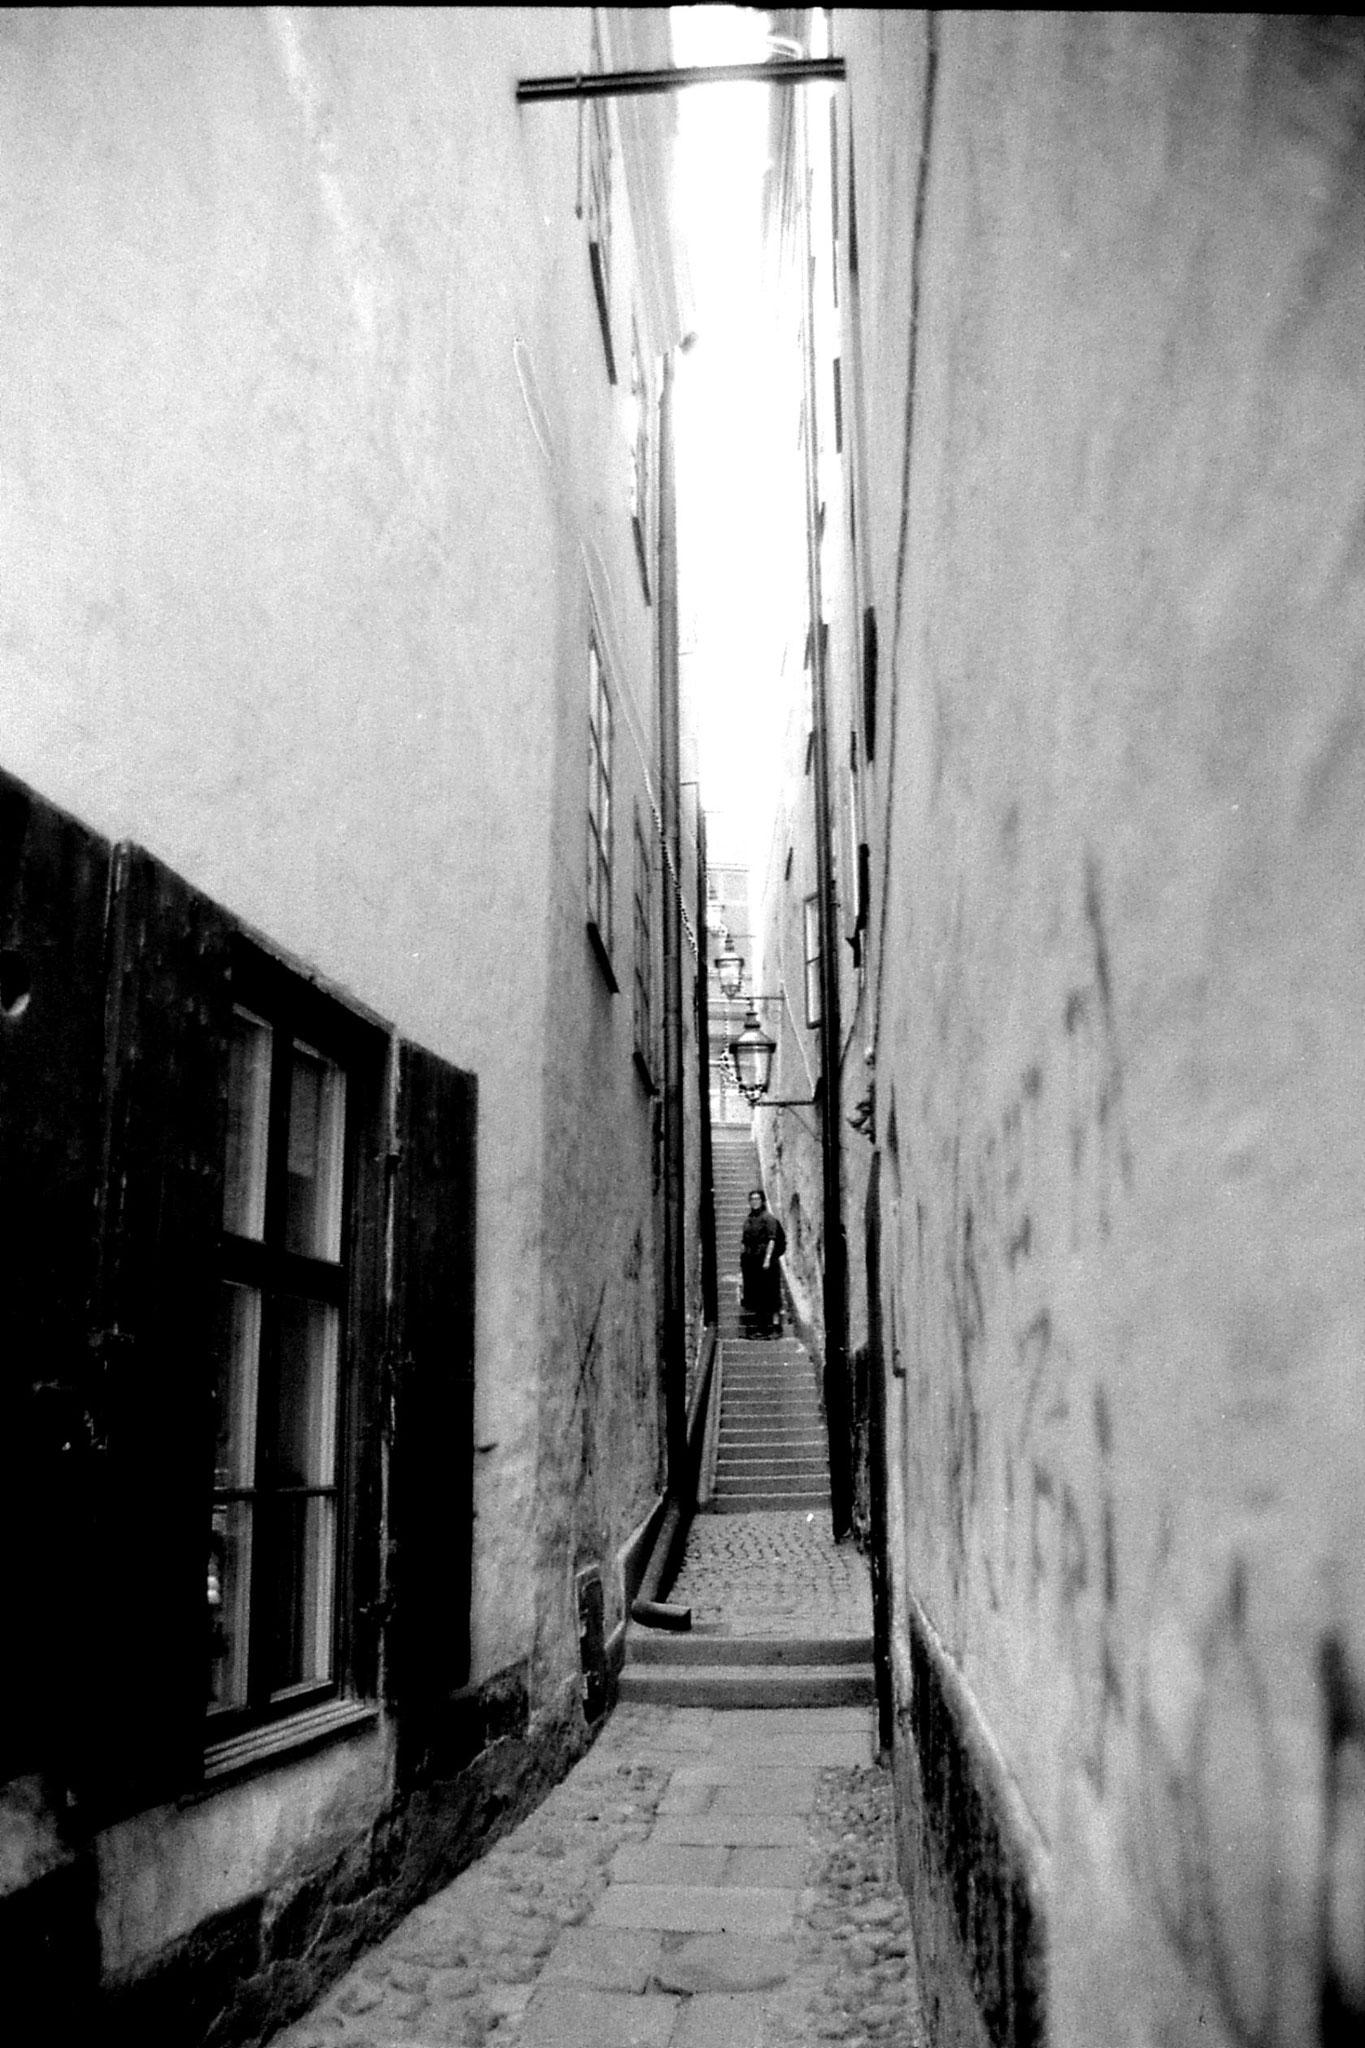 8/9/1988: 43: alleys